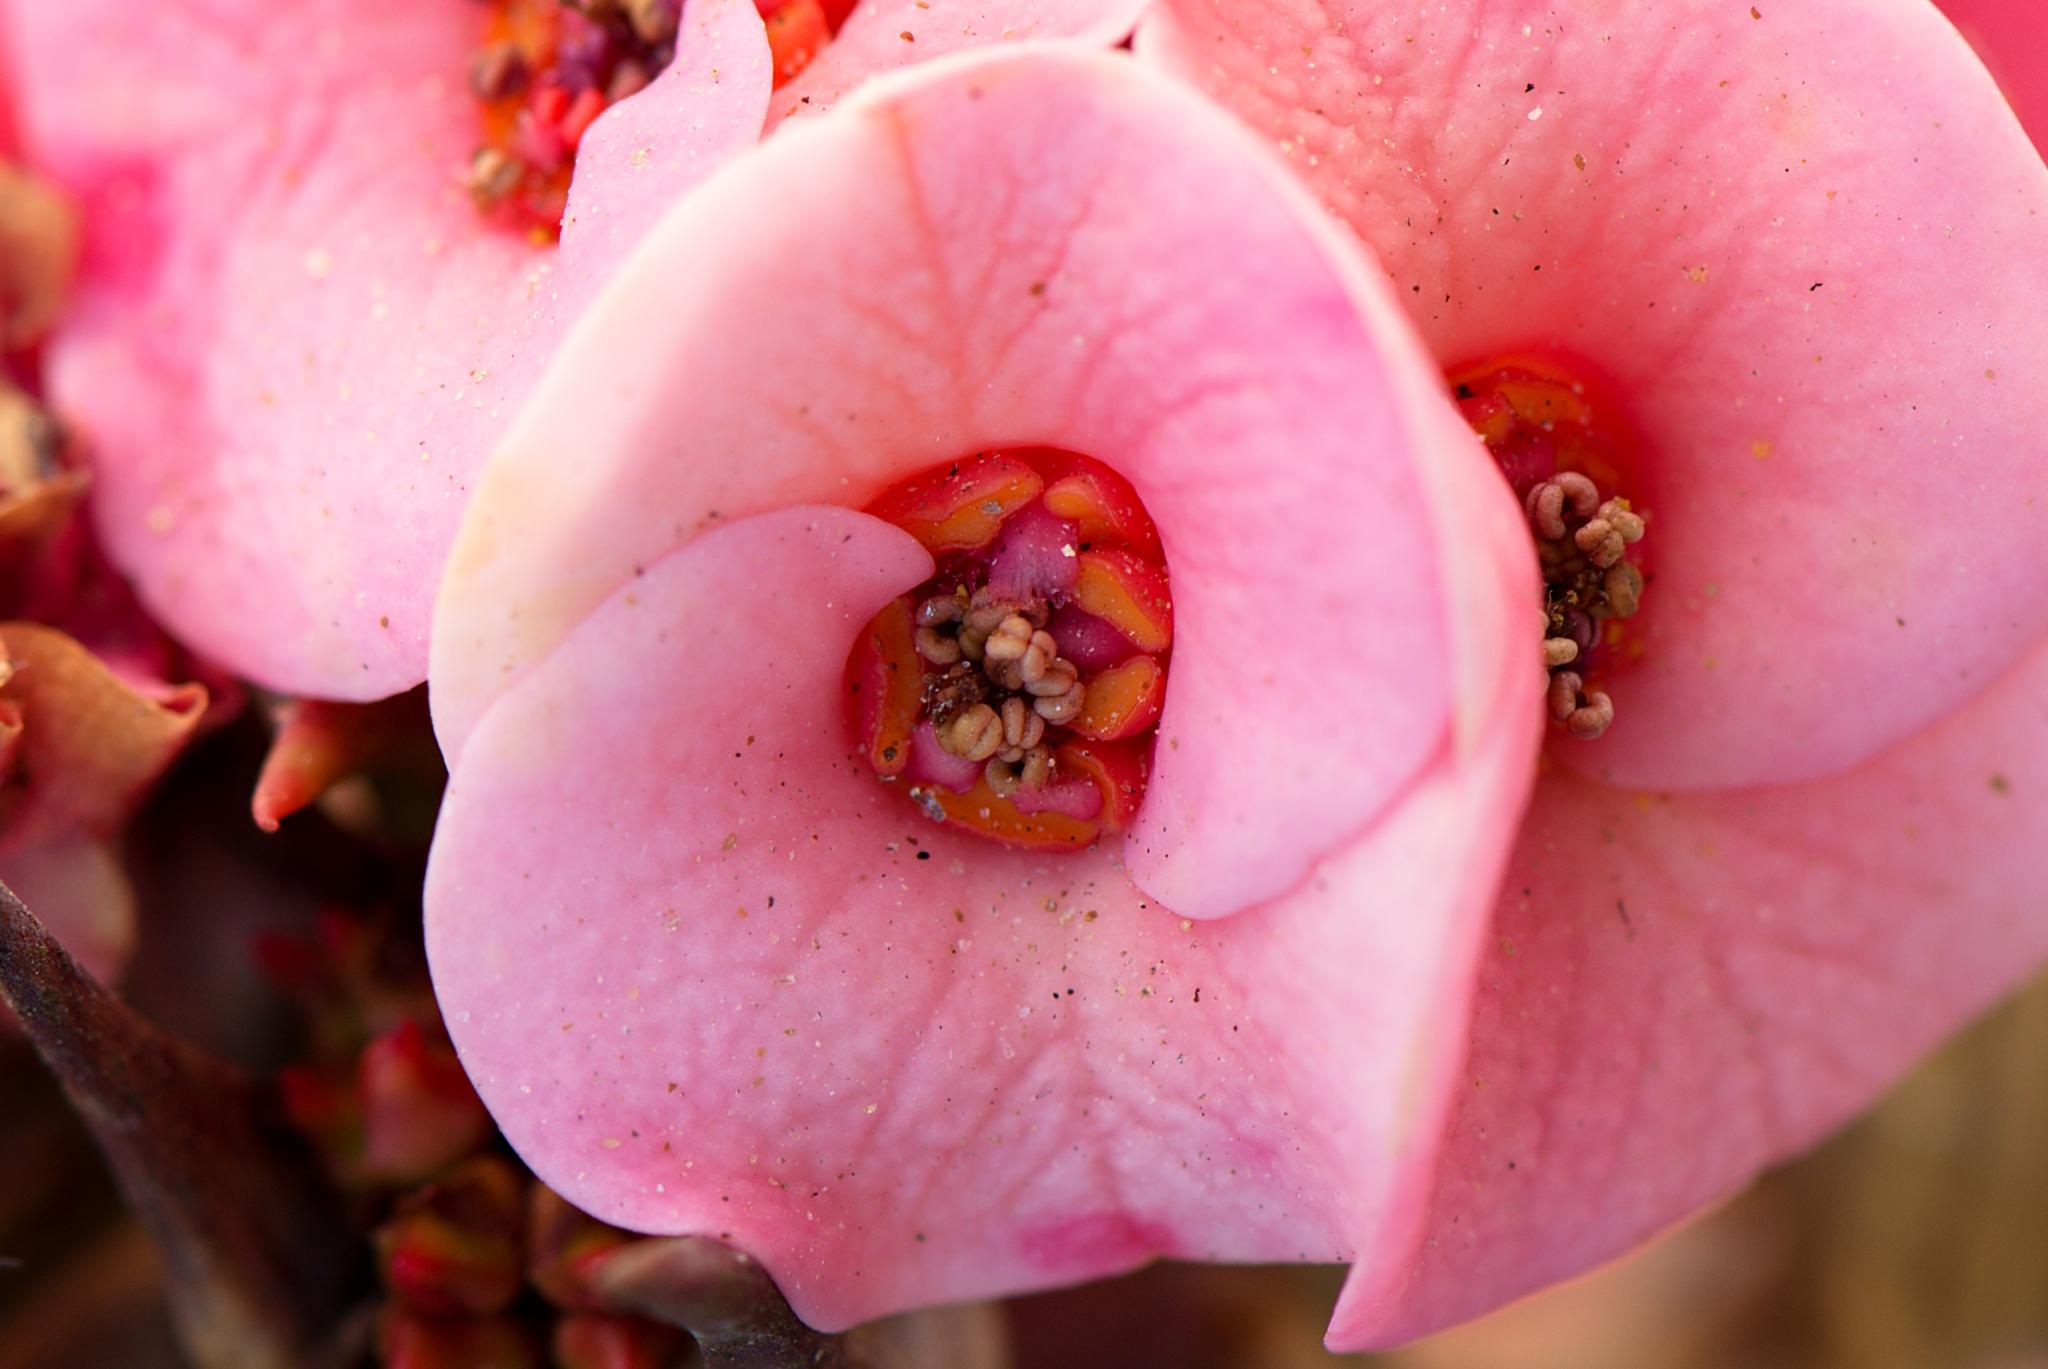 Desert Rose by Harrold Page